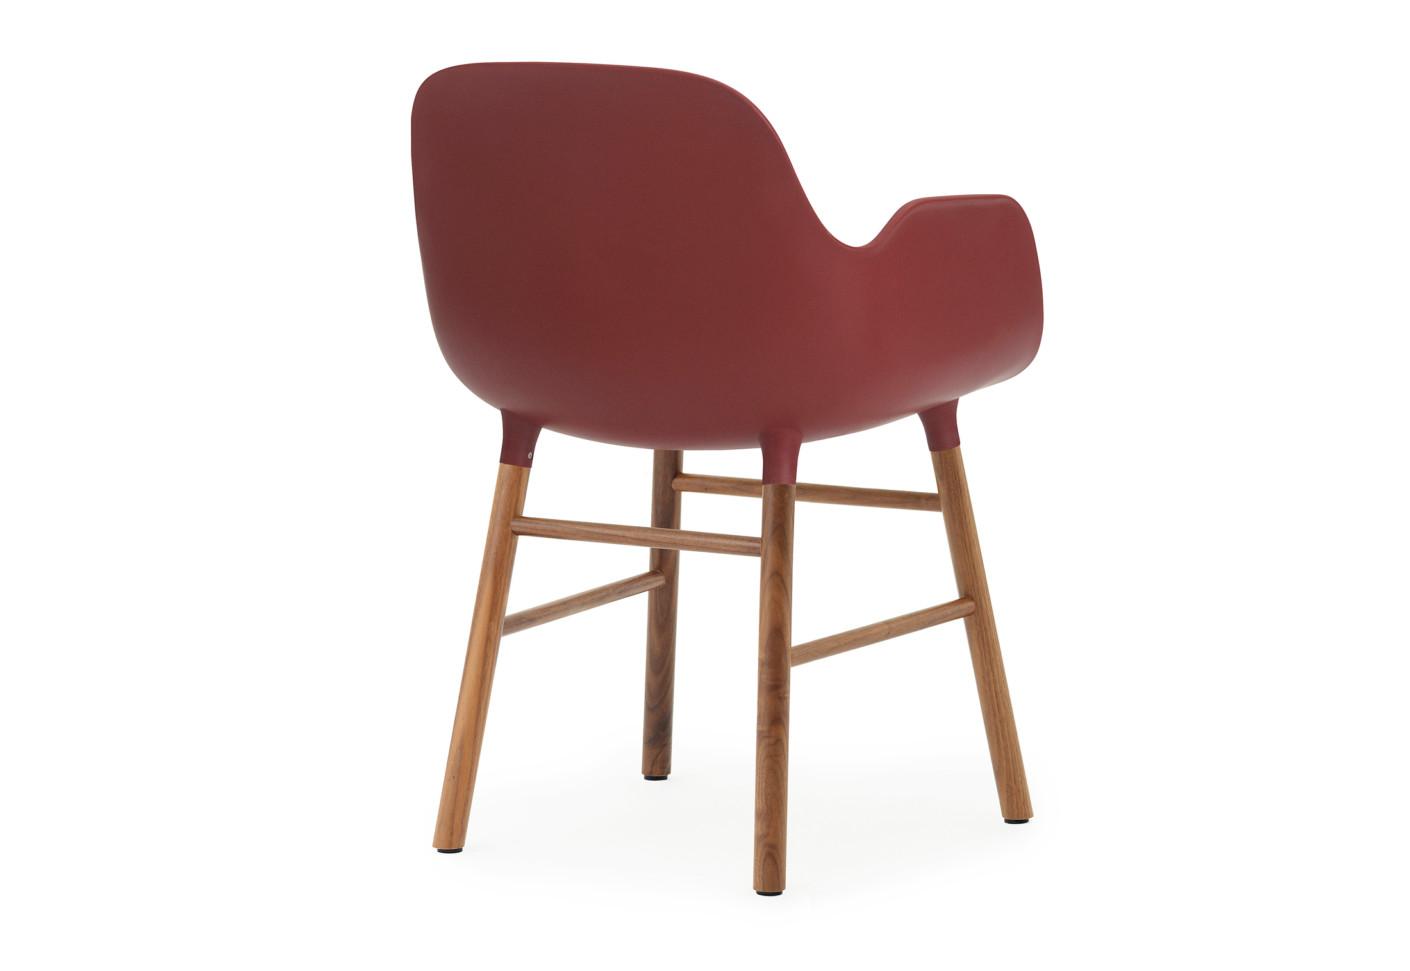 Form Armchair With Wooden Legs By Normann Copenhagen